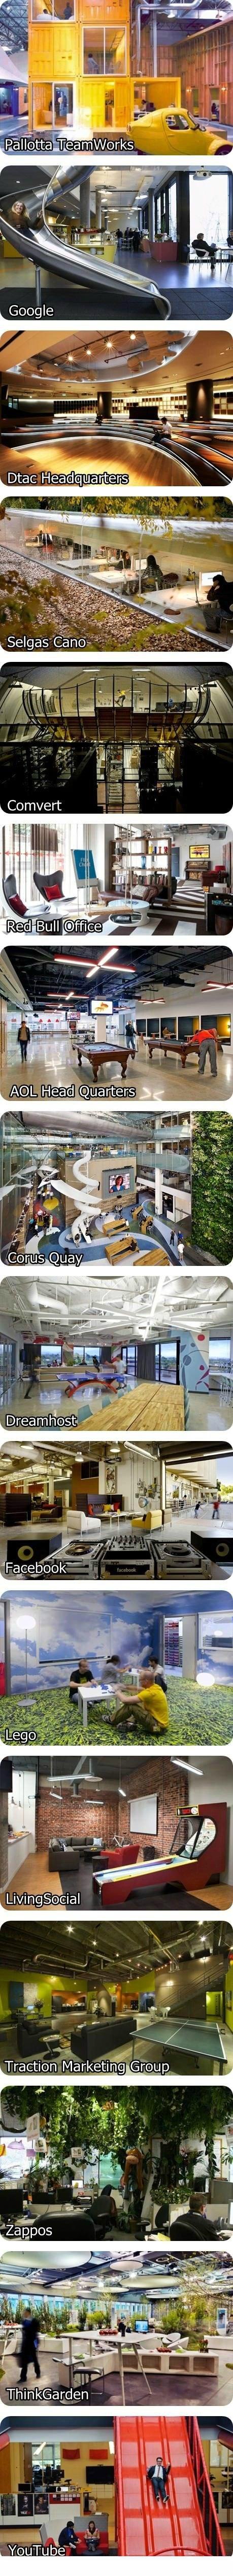 Corporate cribs. .. Funnyjunk HQ Corporate cribs Funnyjunk HQ